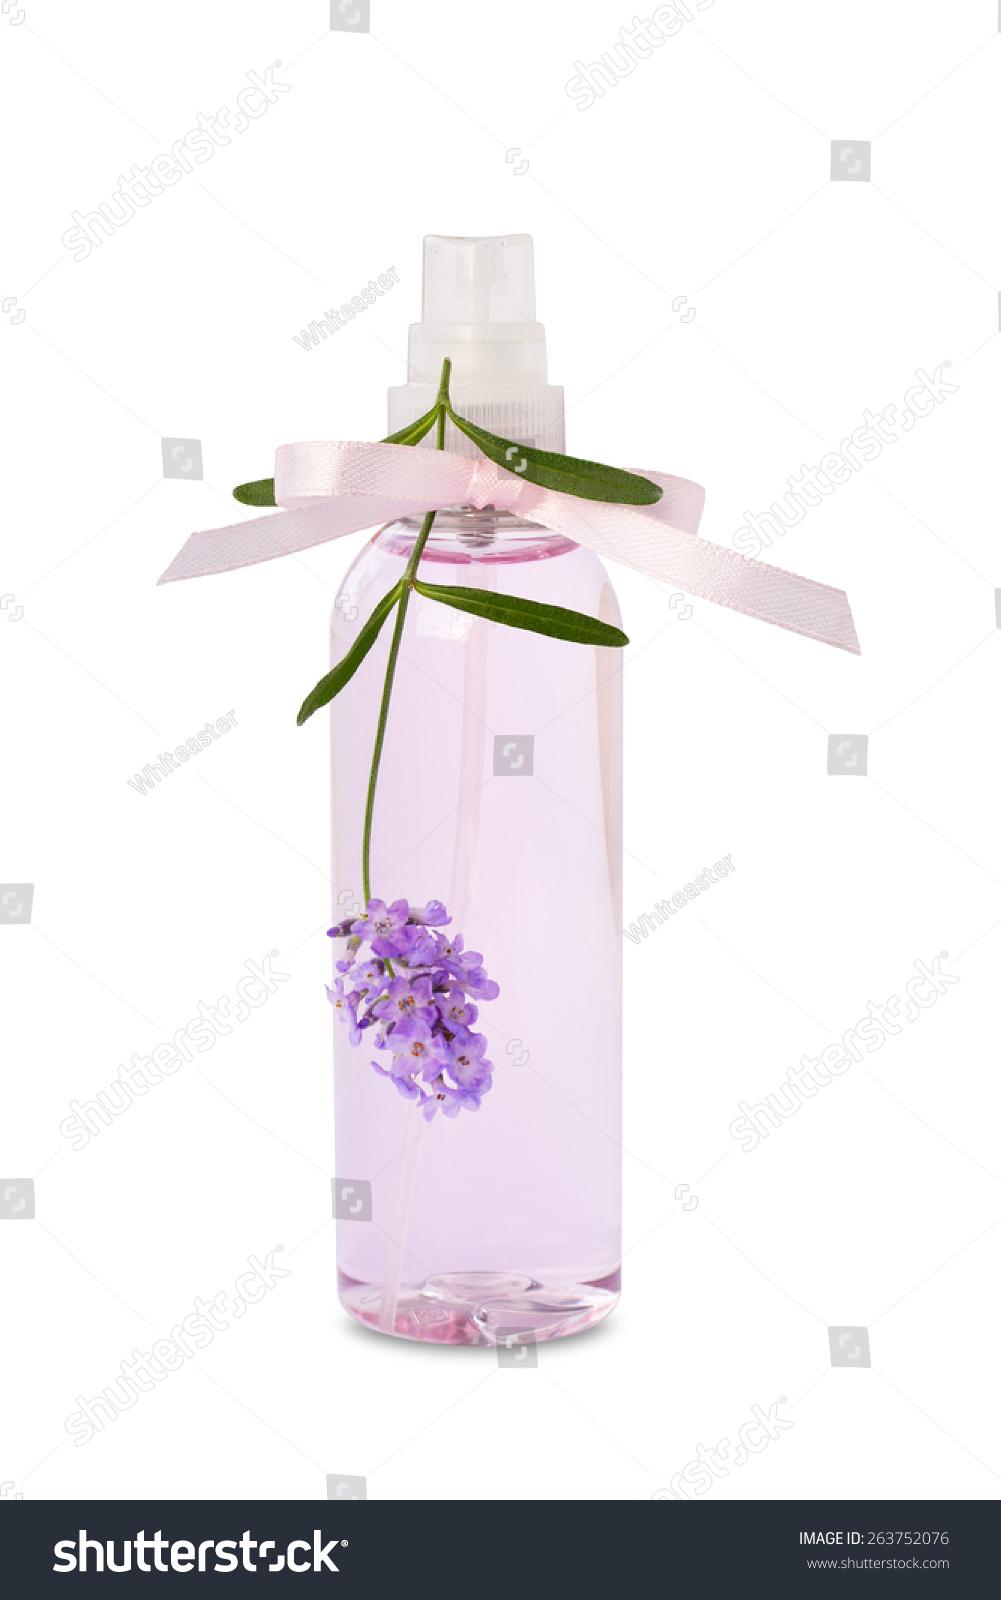 stock-photo-lavender-water-hydrosol-spra